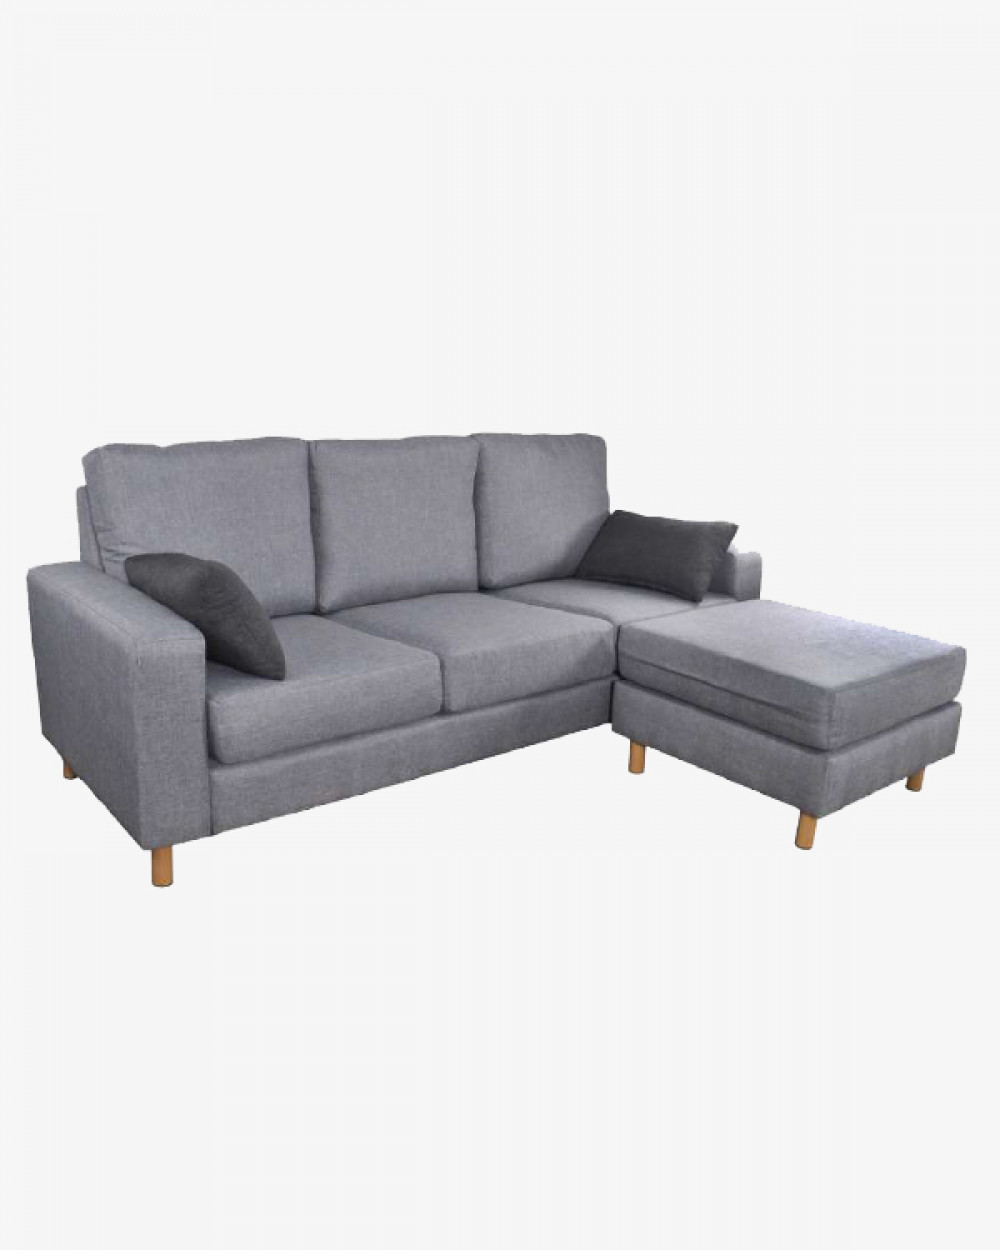 Avery Sofa & Ottoman I 3 Seater